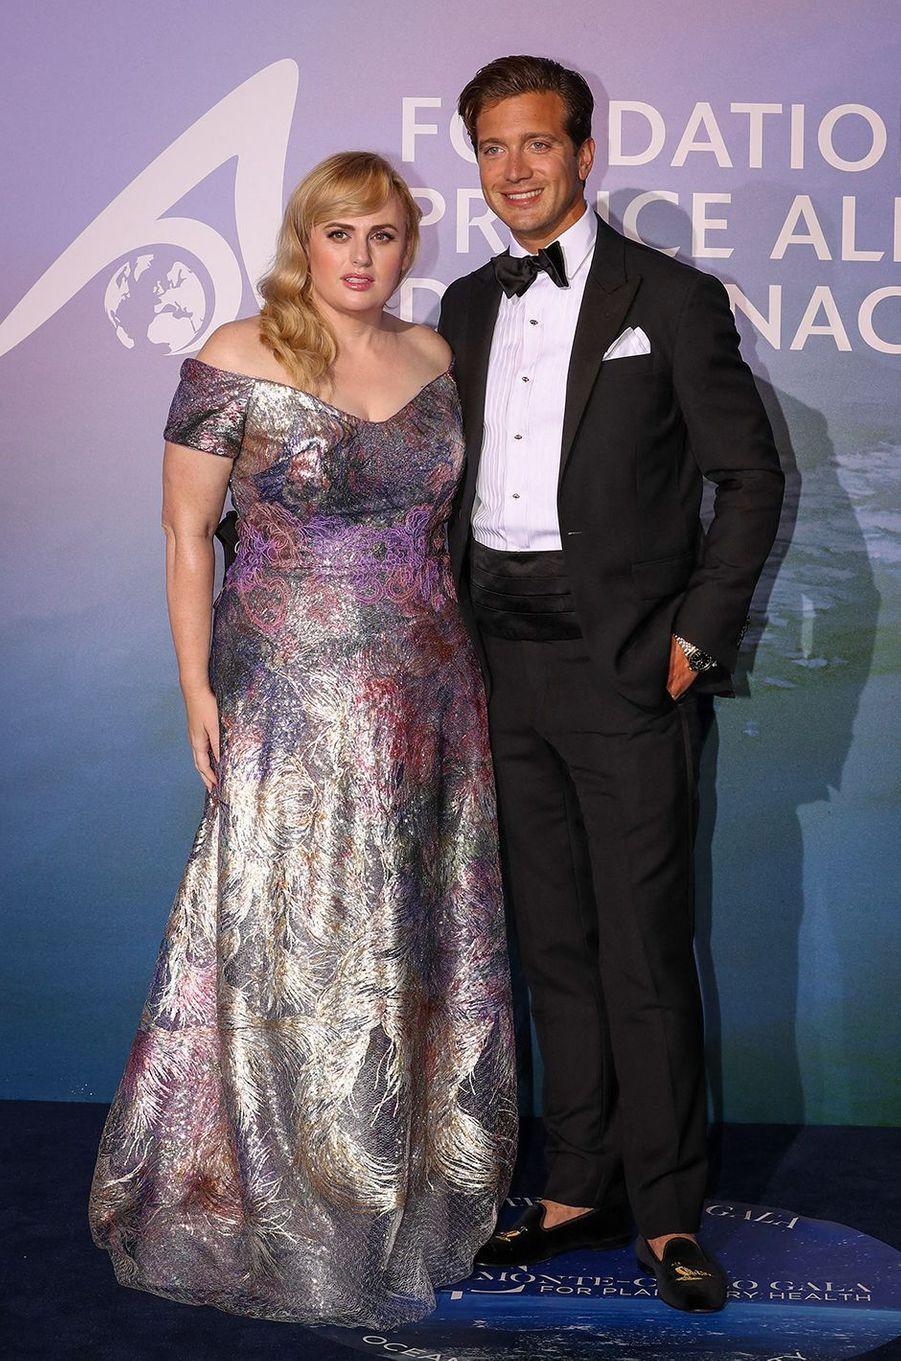 Rebel Wilson et son petit ami Jacob BuschauMonte-Carlo Gala for Planetary Health organisé par la Fondation Prince Albert II de Monaco le 24 septembre 2020